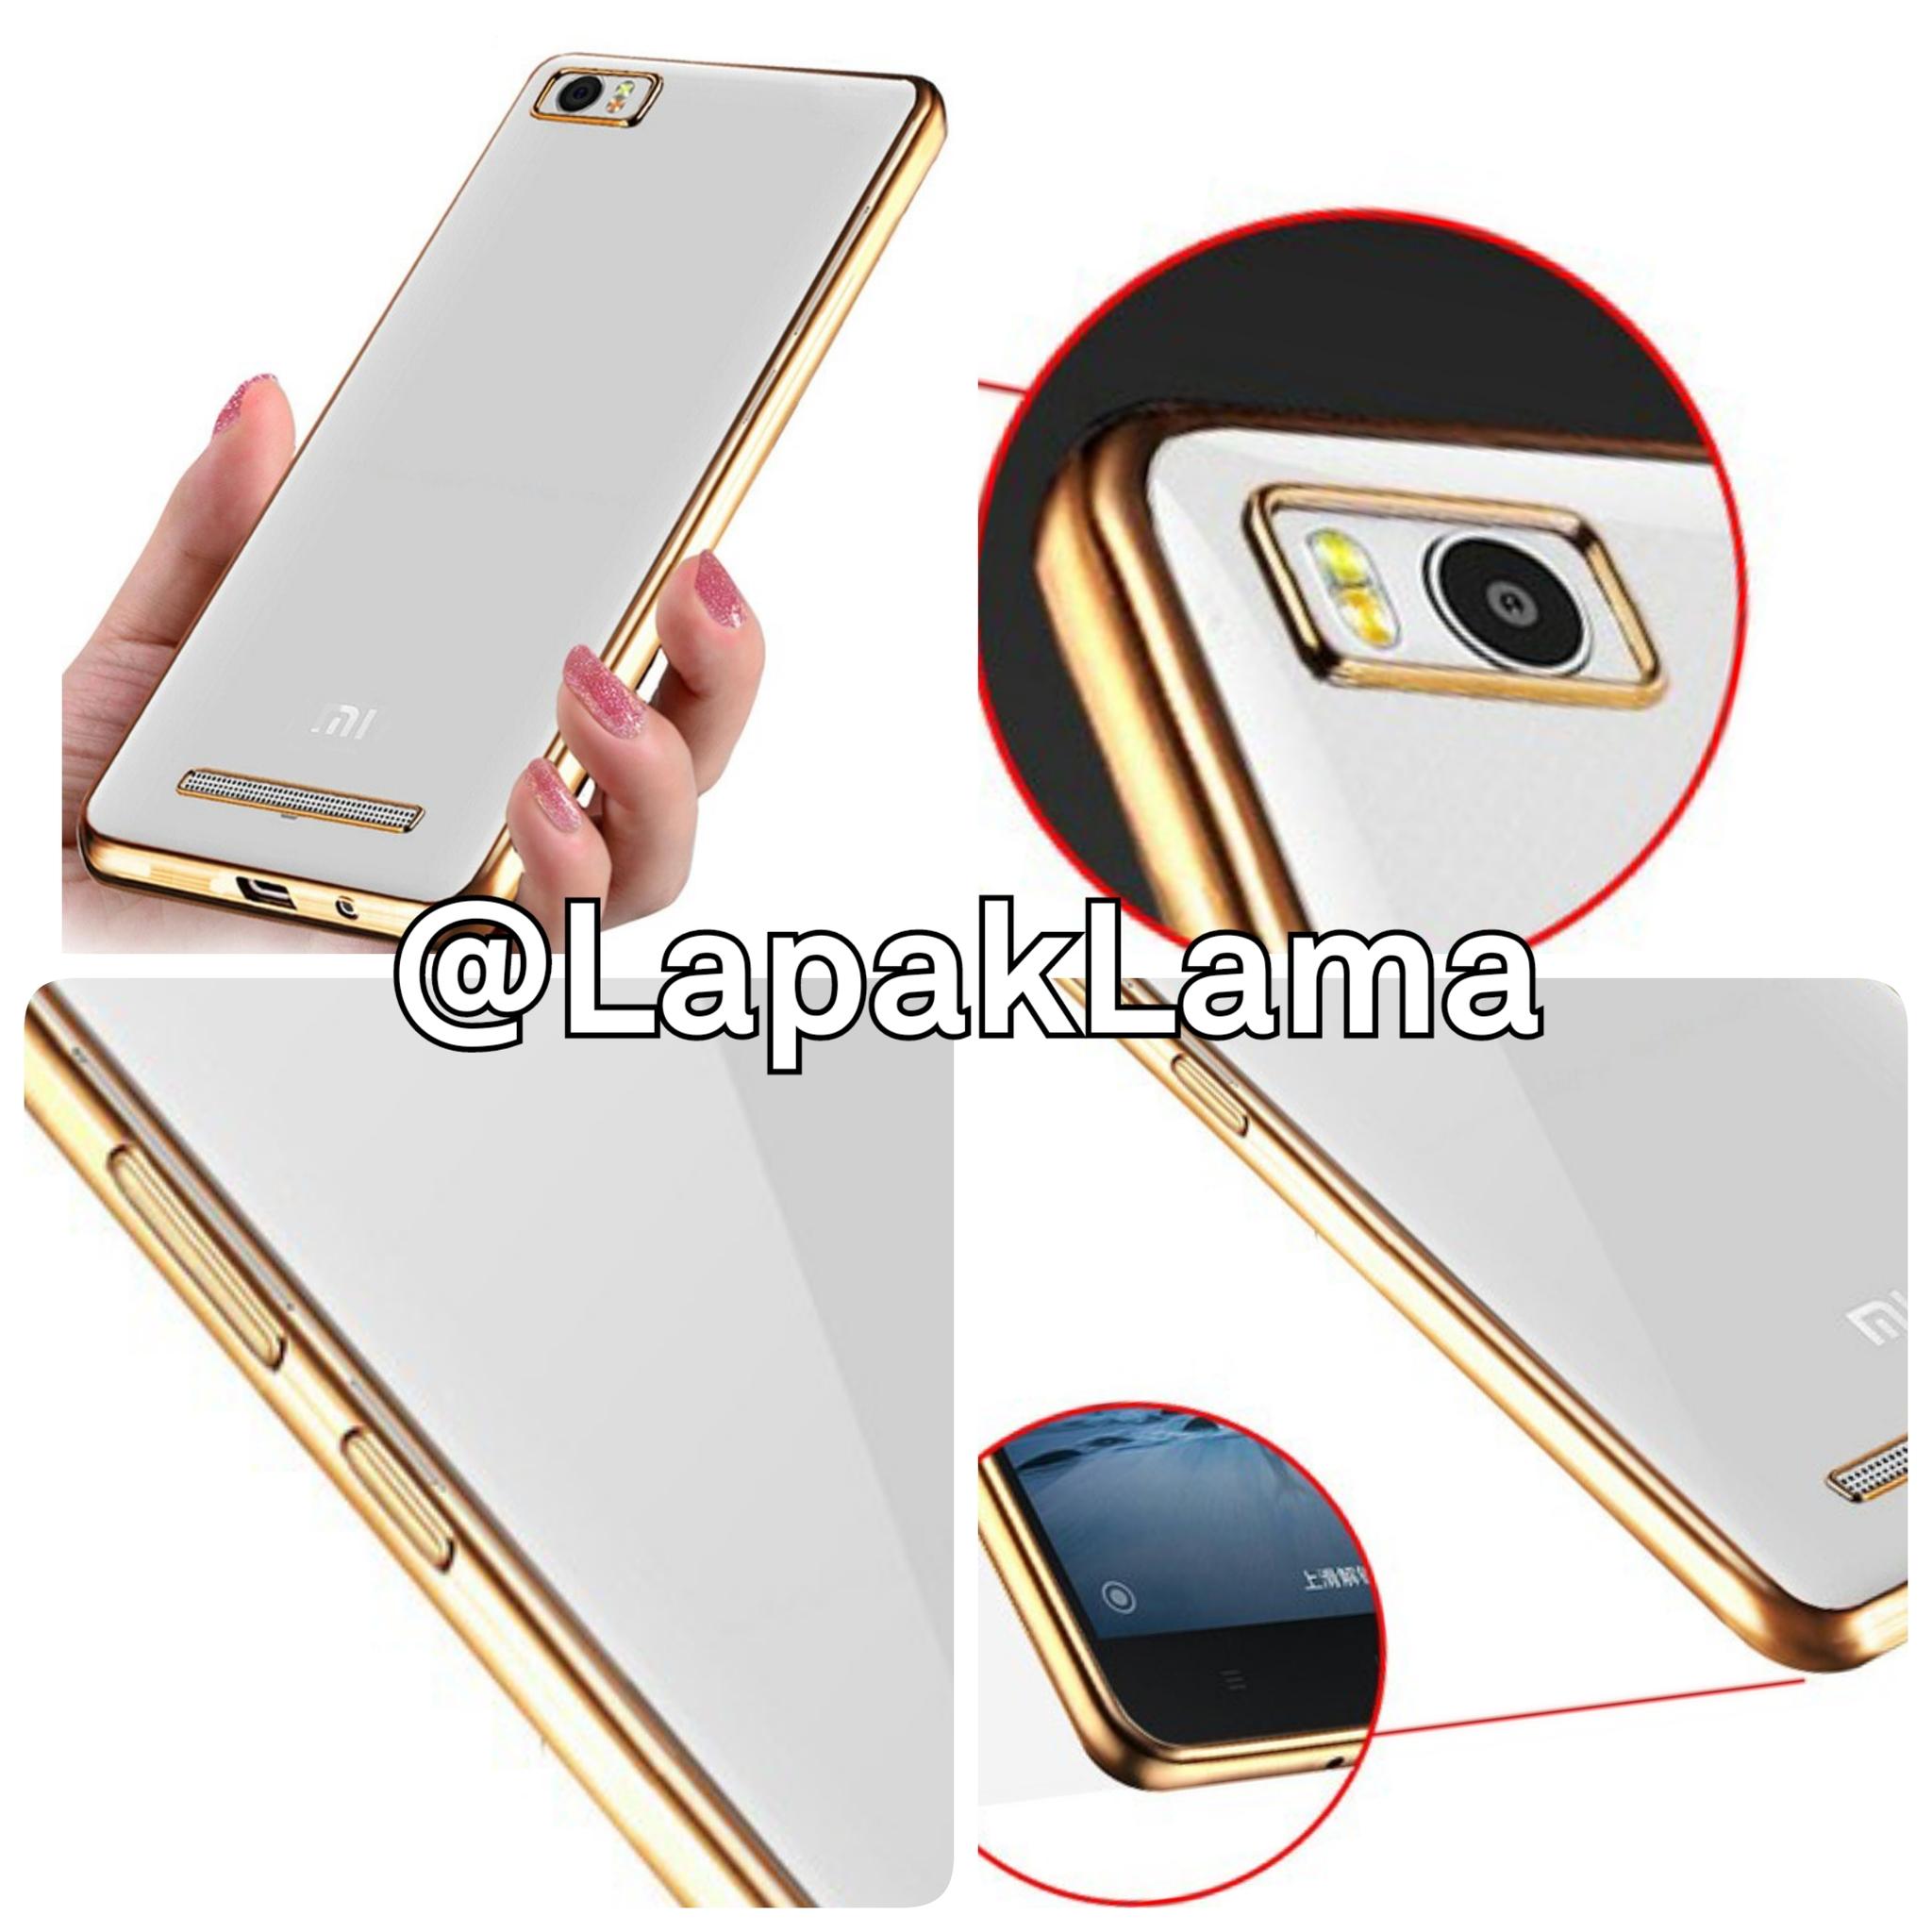 Softcase Xiaomi Mi4 List Chrome Gold Transparant Tempered Glass Oren Lenovo Mi5s Clear Jual Noblecase Electroplated Case Mi4i Mi 4i 4c Mi4c Scmi4i Lapak Kelin